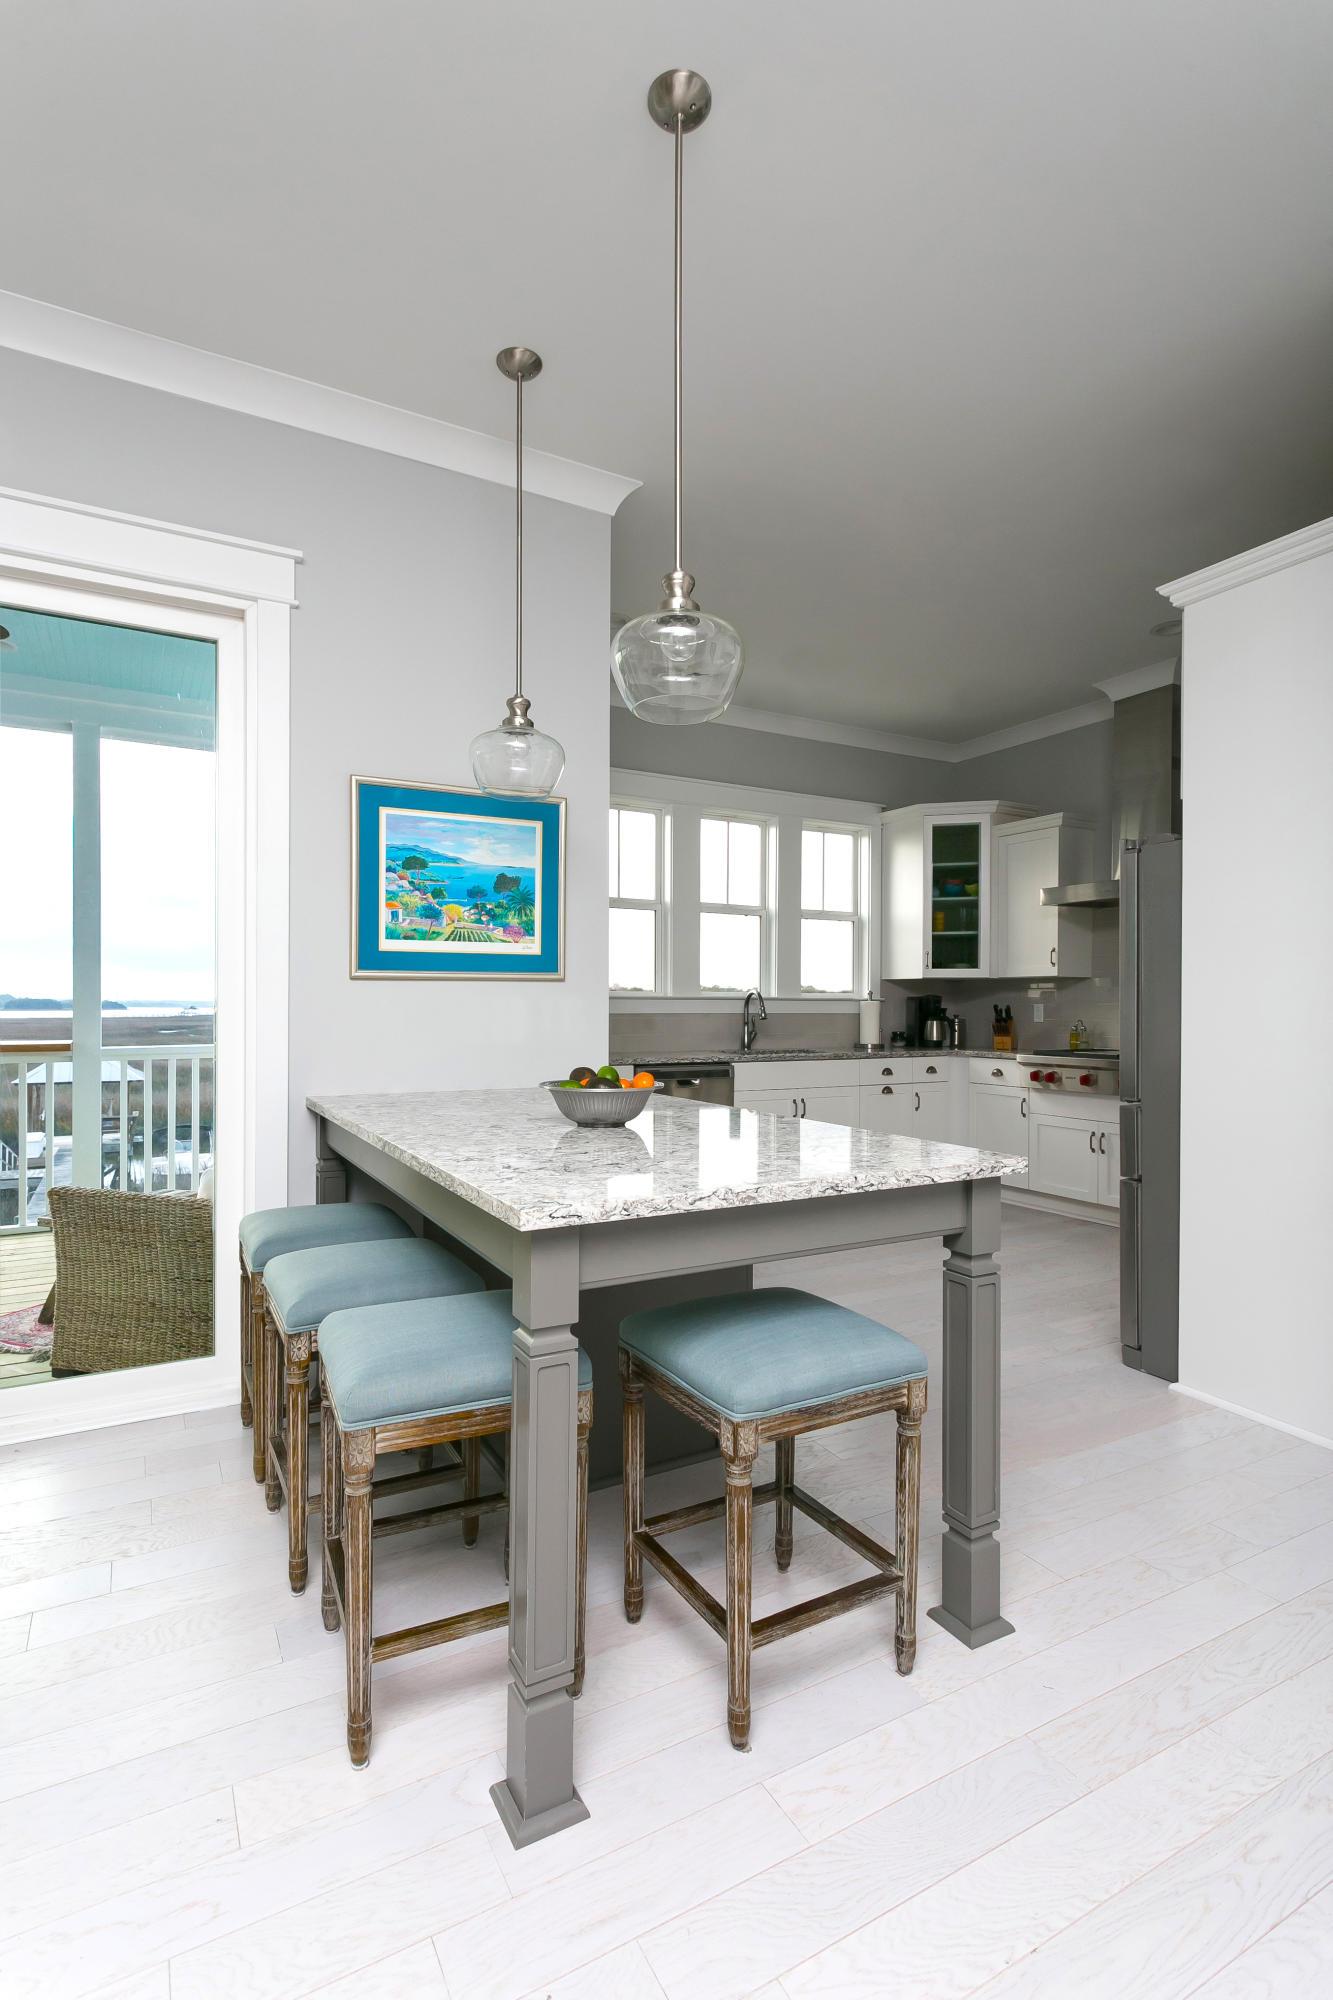 Ravens Point Plantation Homes For Sale - 5576 Frisco, Johns Island, SC - 2